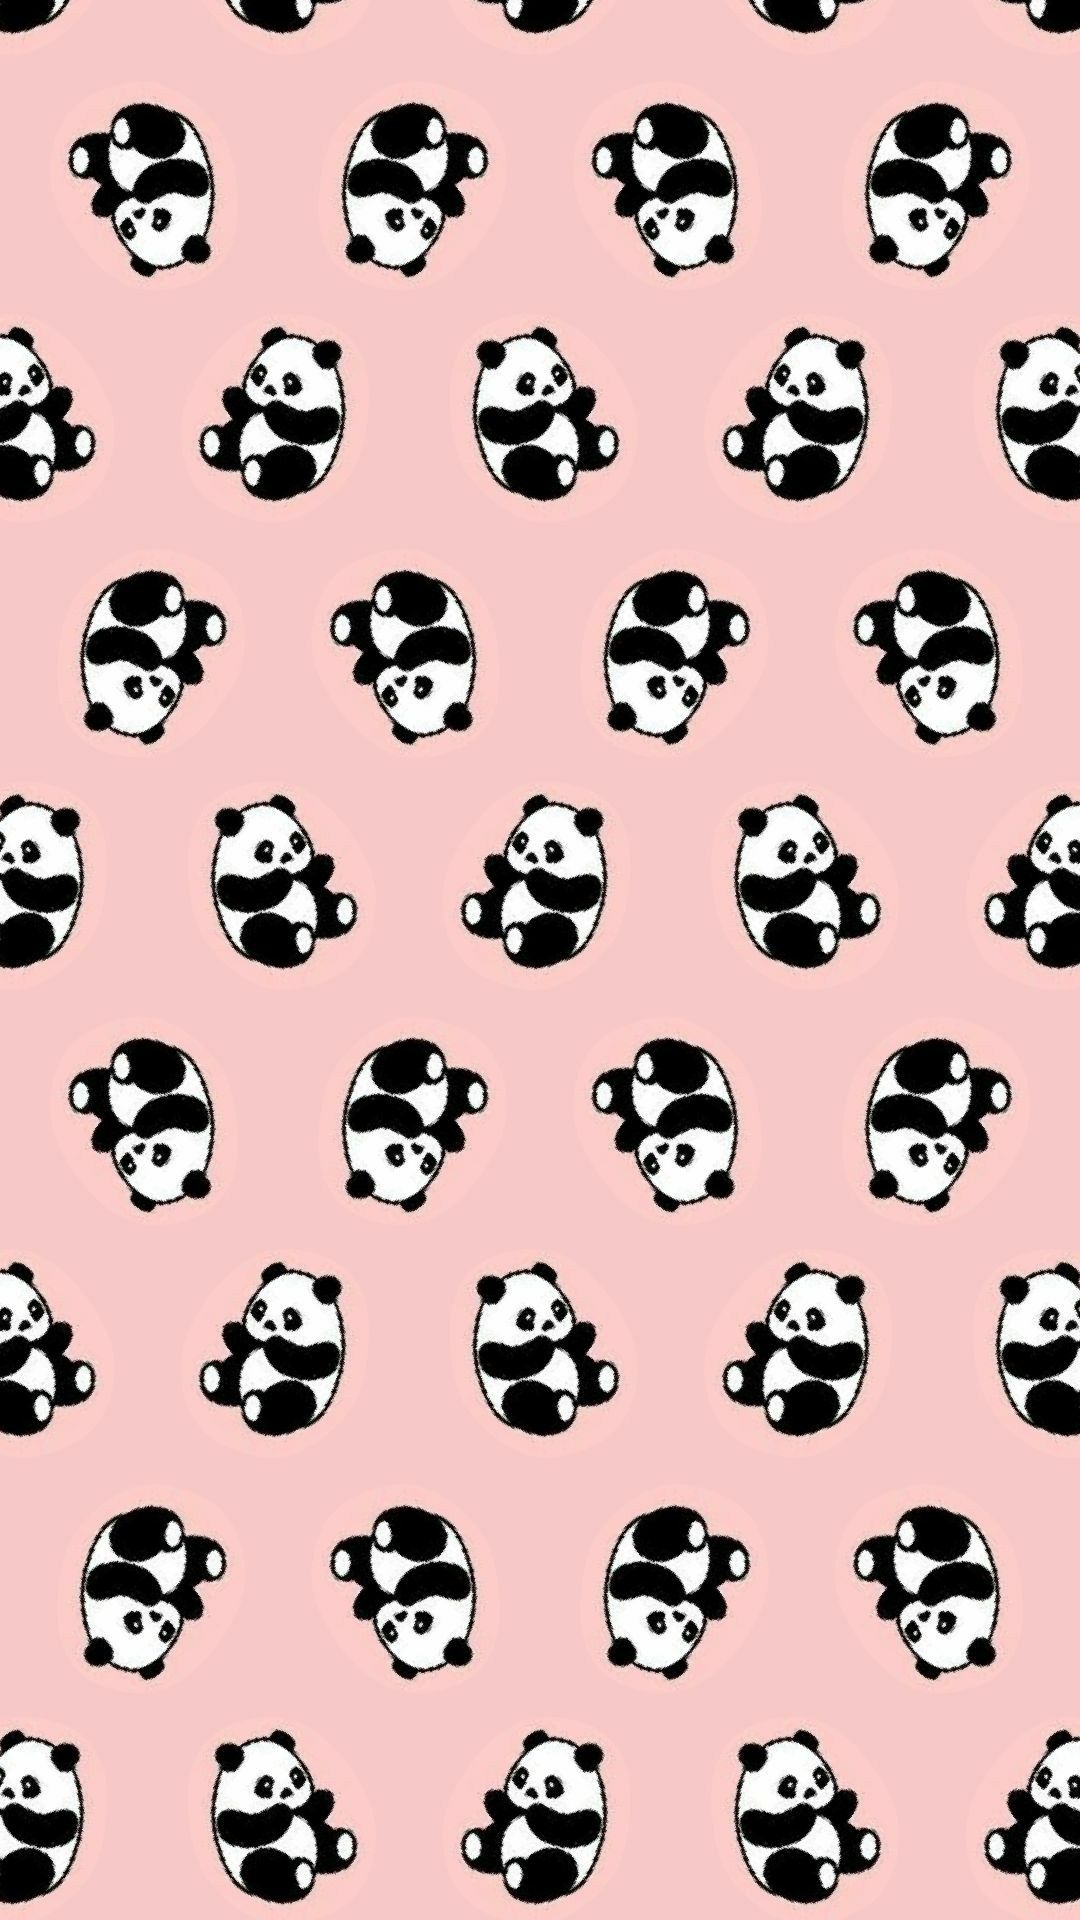 Gambar Panda Untuk Wallpaper Wa HD Wallpaper